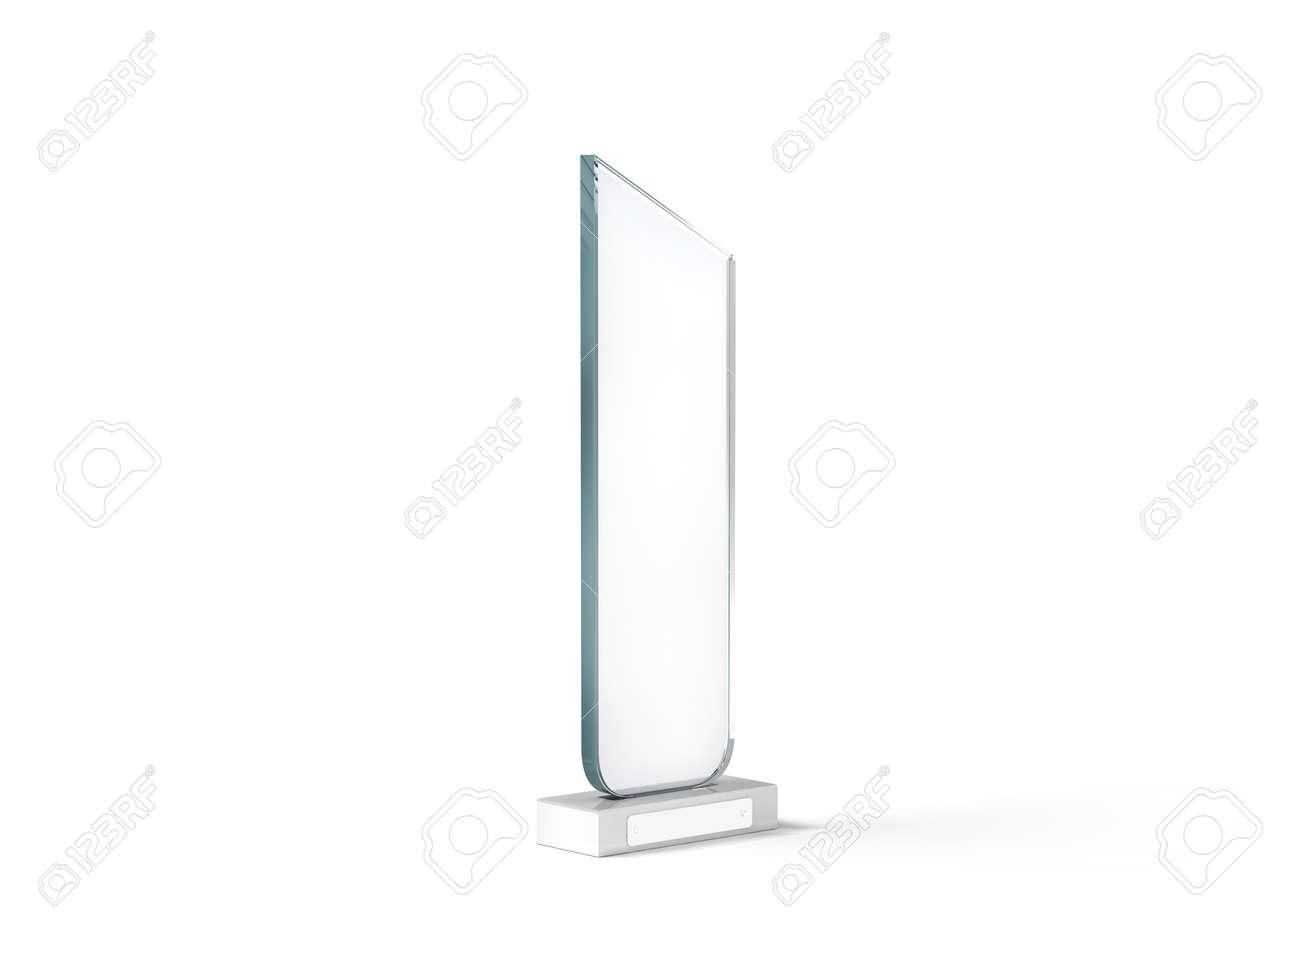 Blank Tall Glass Trophy Mockup, 3d Rendering. Empty Acrylic Award ...